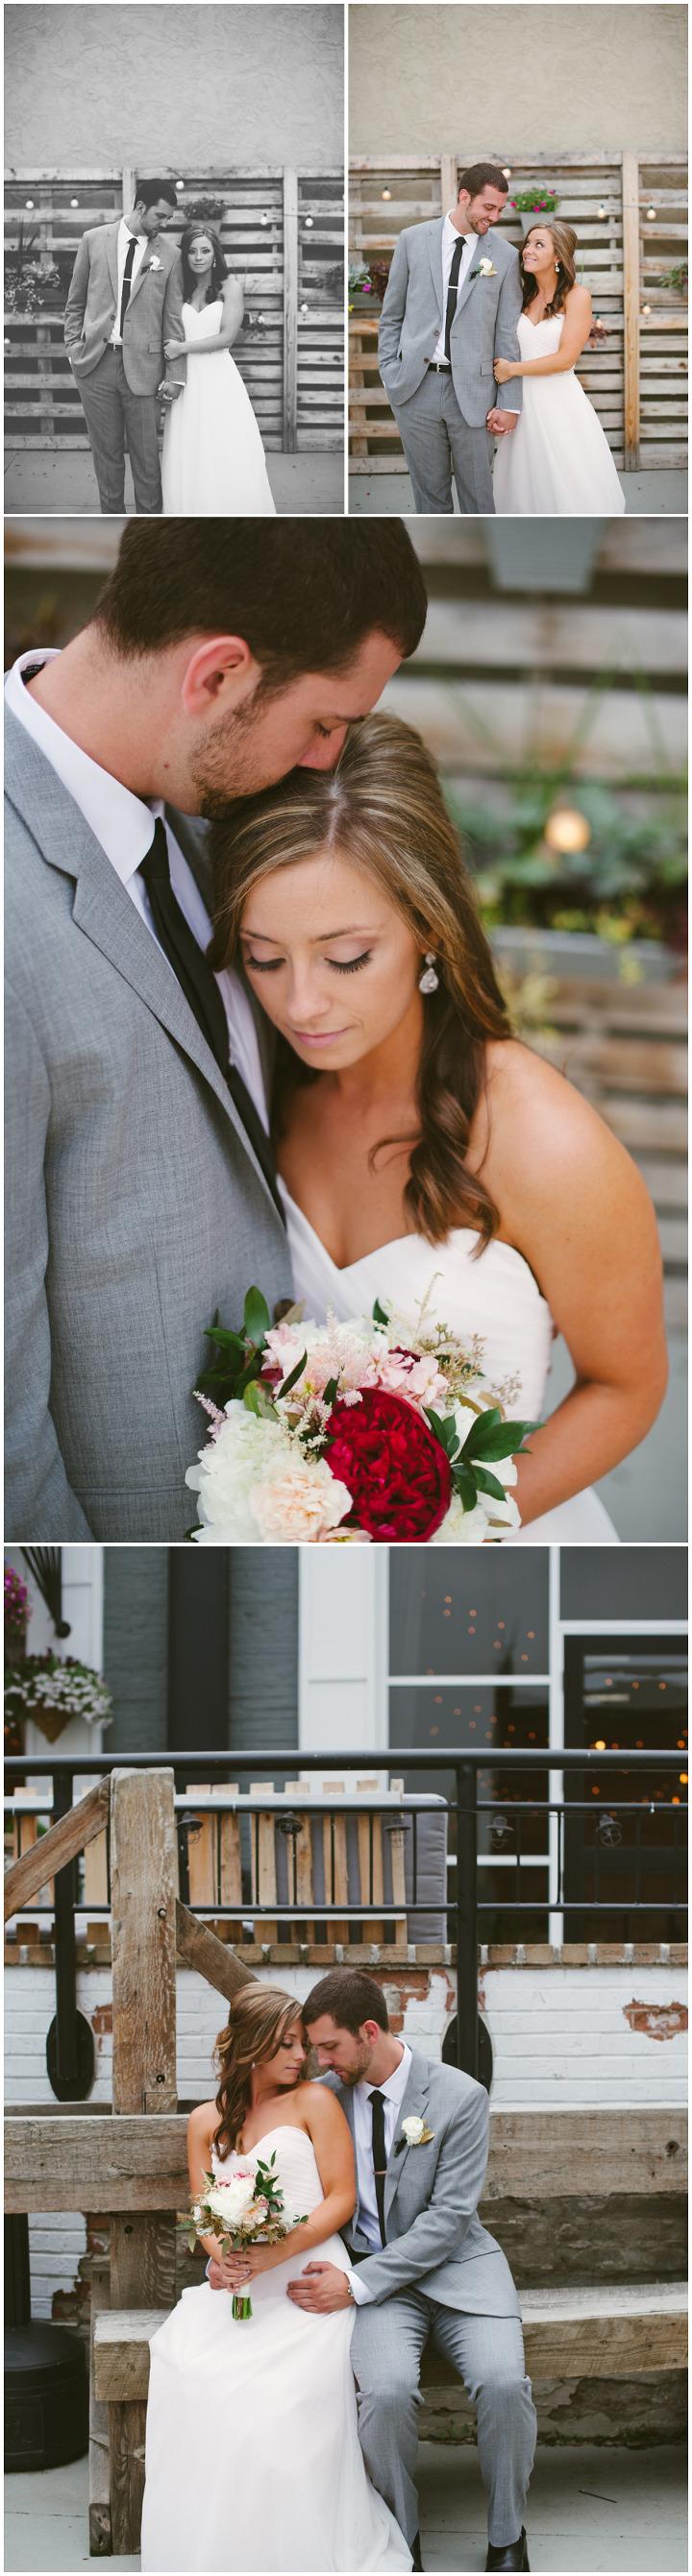 Blog Collage-Lydia+Tom11